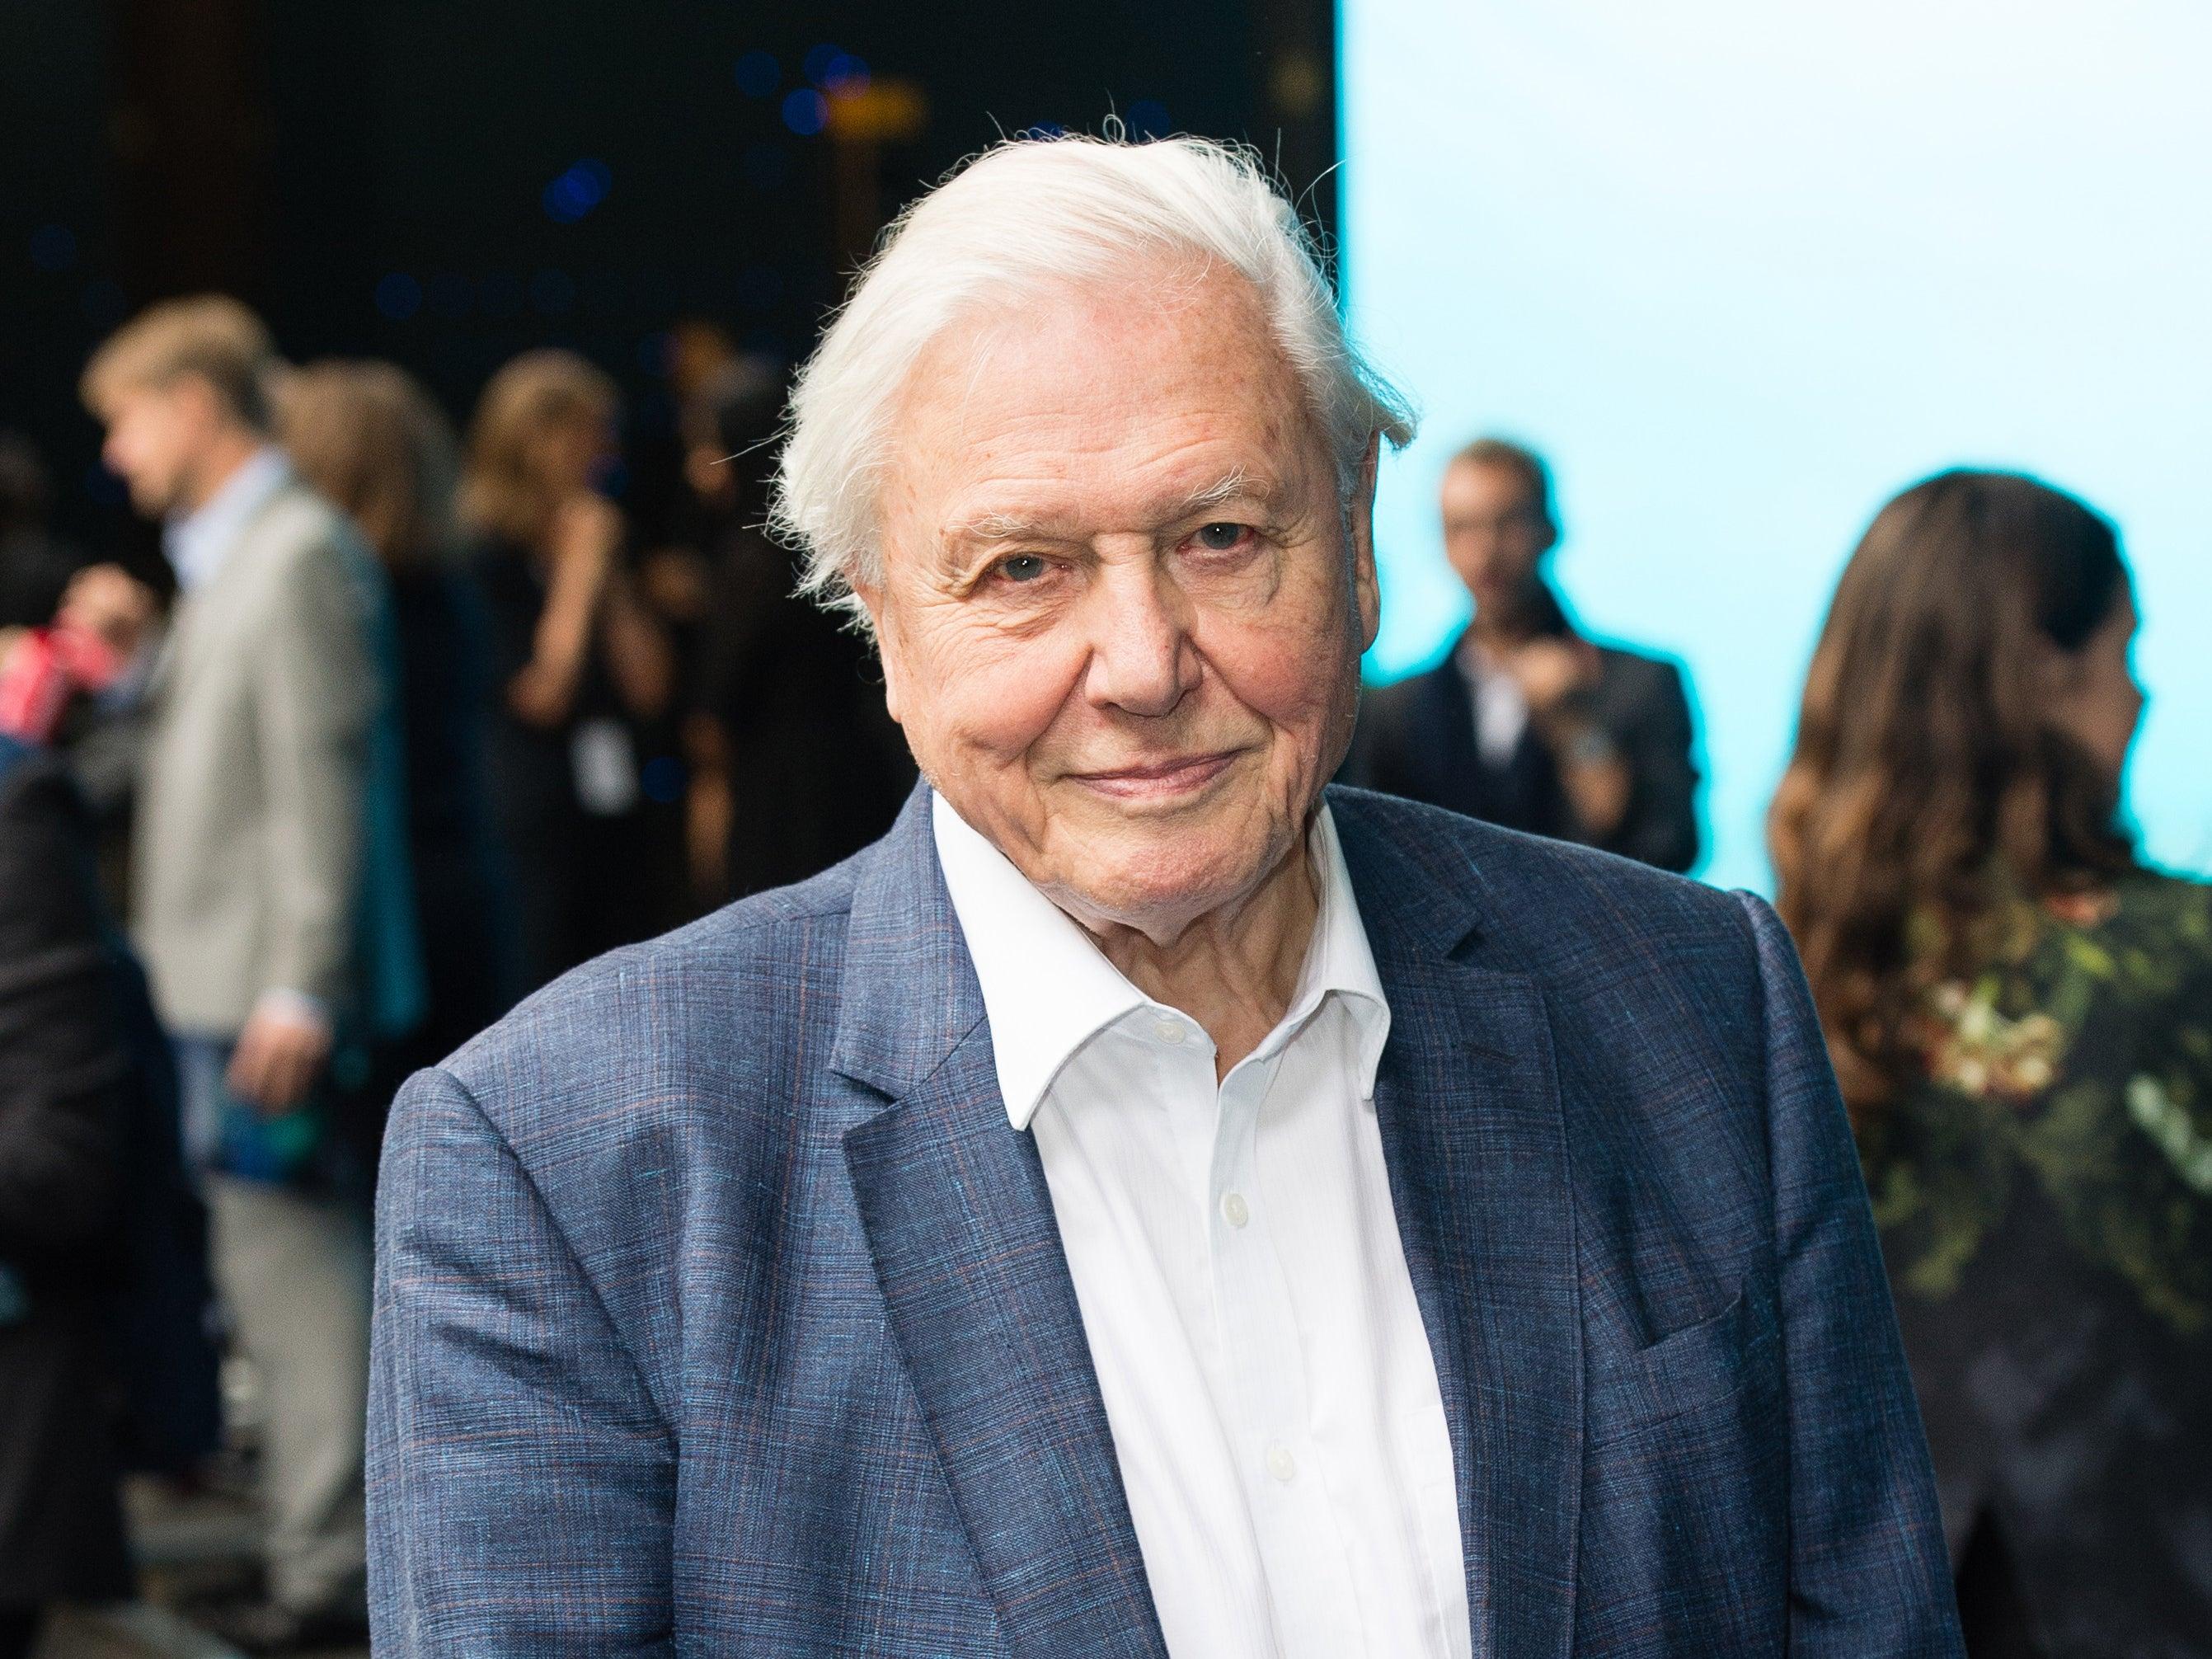 Sir David Attenborough breaks record as fastest Instagram user to reach one million followers